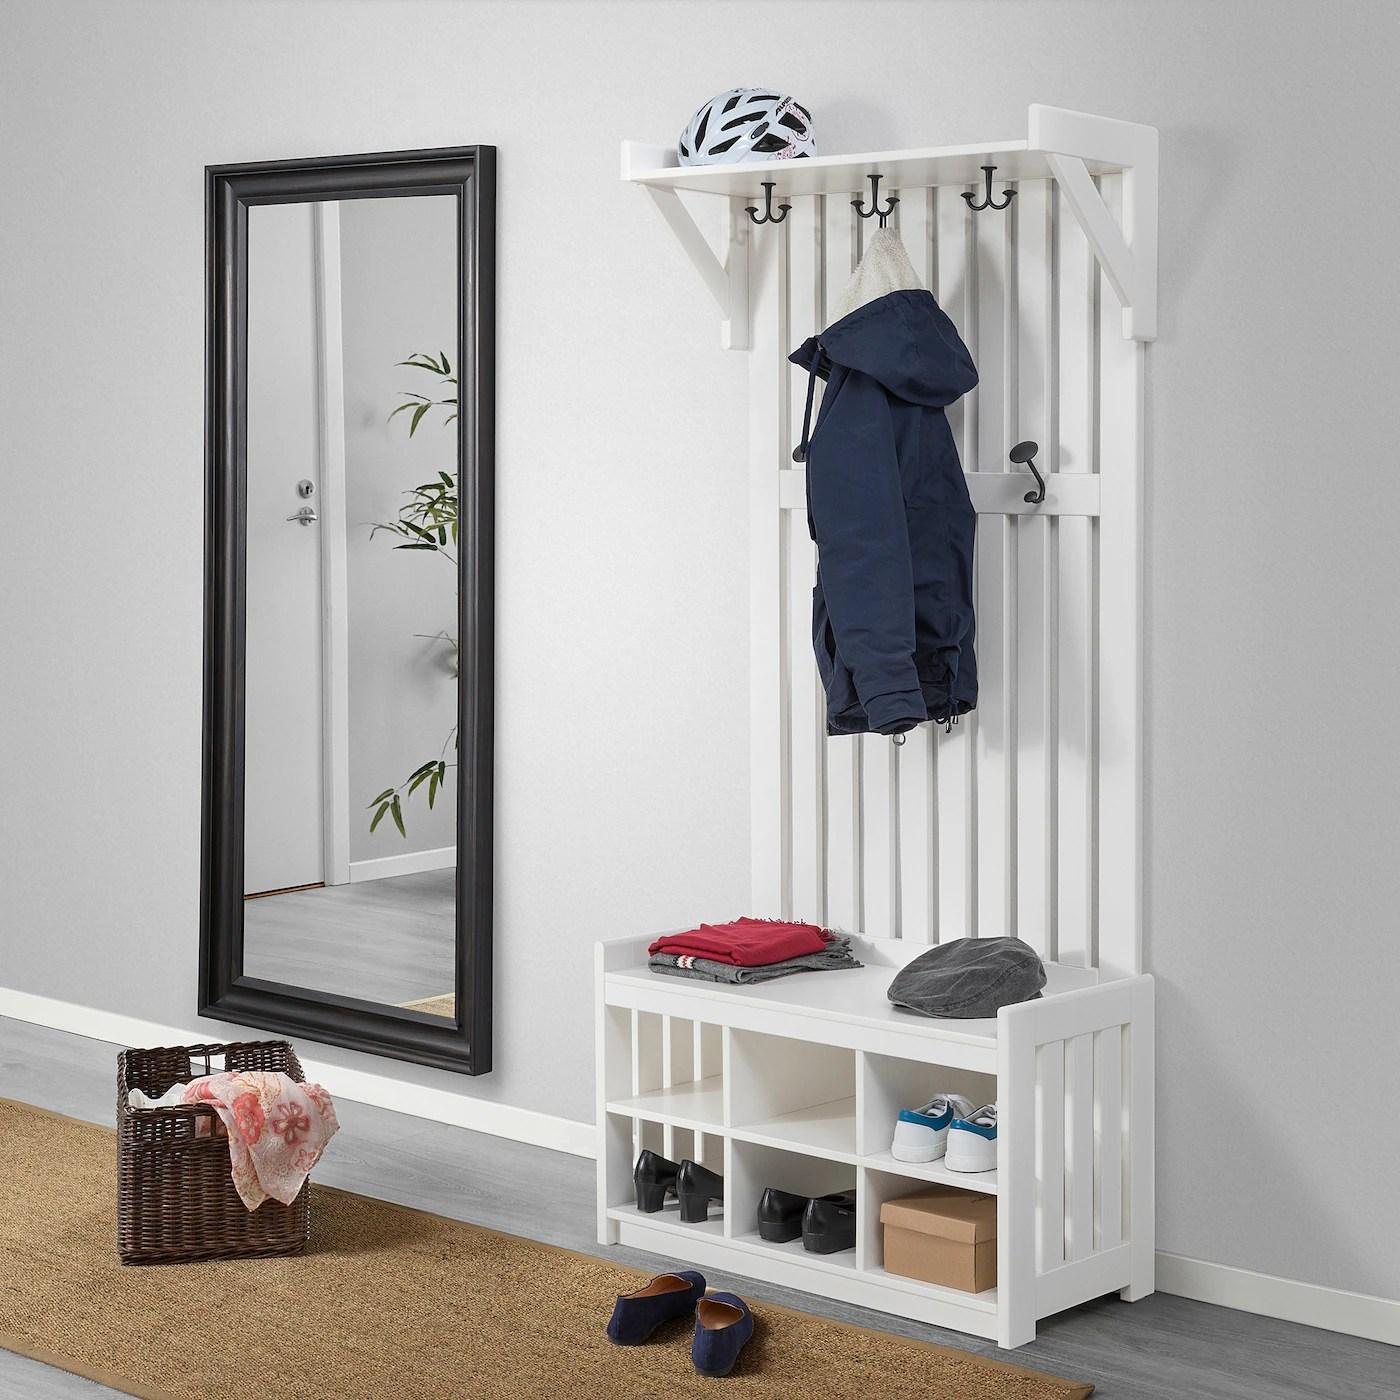 panget coat rack with shoe storage bench white 33 1 2x16 1 8x78 3 4